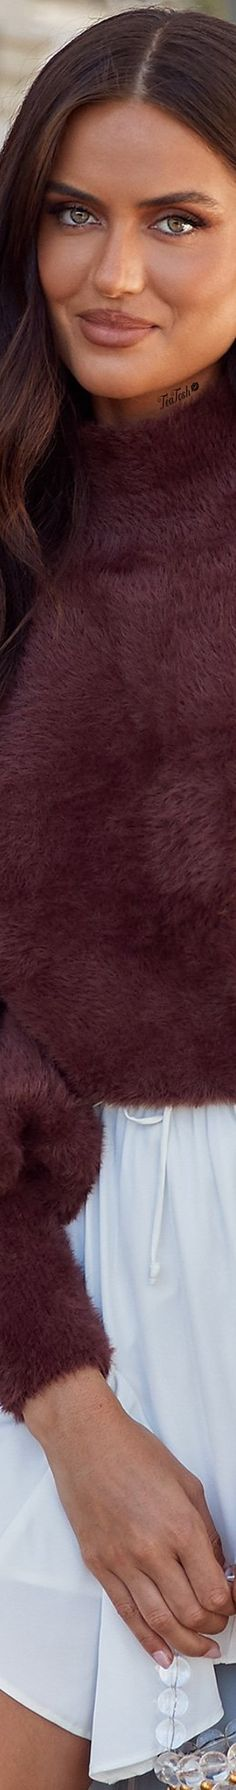 ❈Téa Tosh❈ #alamourthelabel #teatosh #taliarichman Alamour The Label, Rich Man, Chocolate Brown, Turtle Neck, Sweaters, Fashion, Moda, Fashion Styles, Sweater